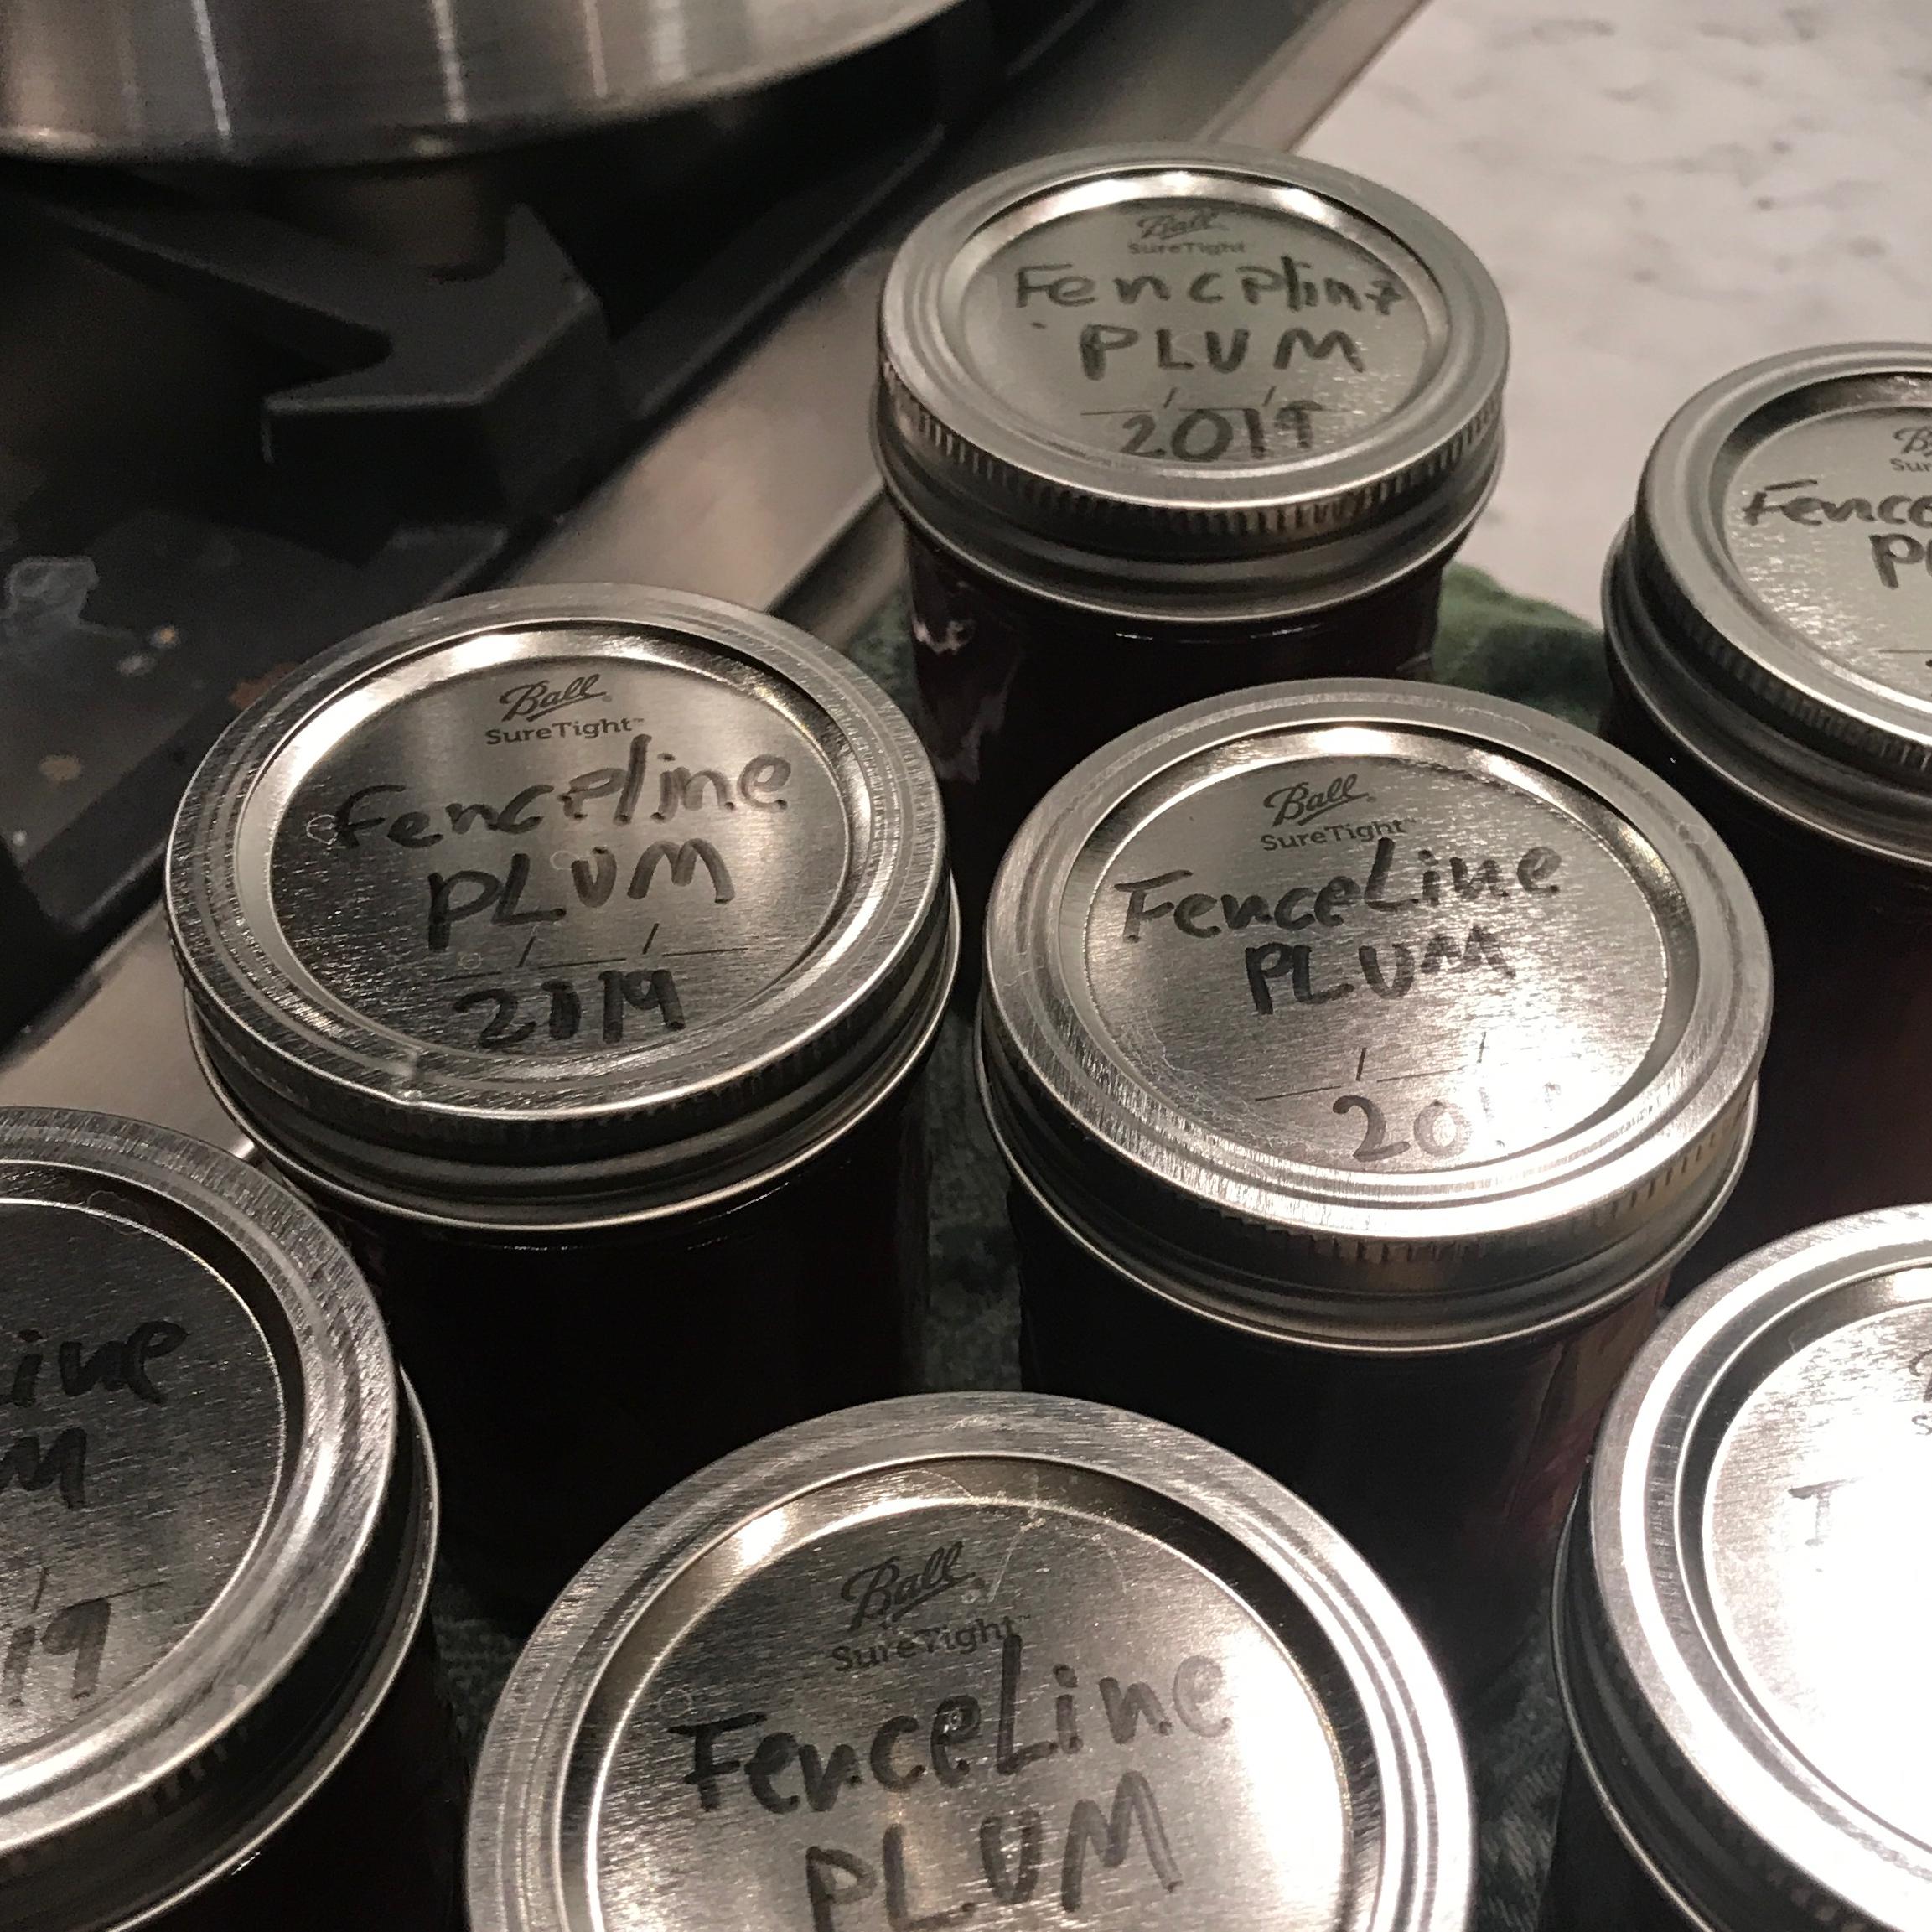 Rachel's Sugar Plum Spice Jam Ivan Clinton